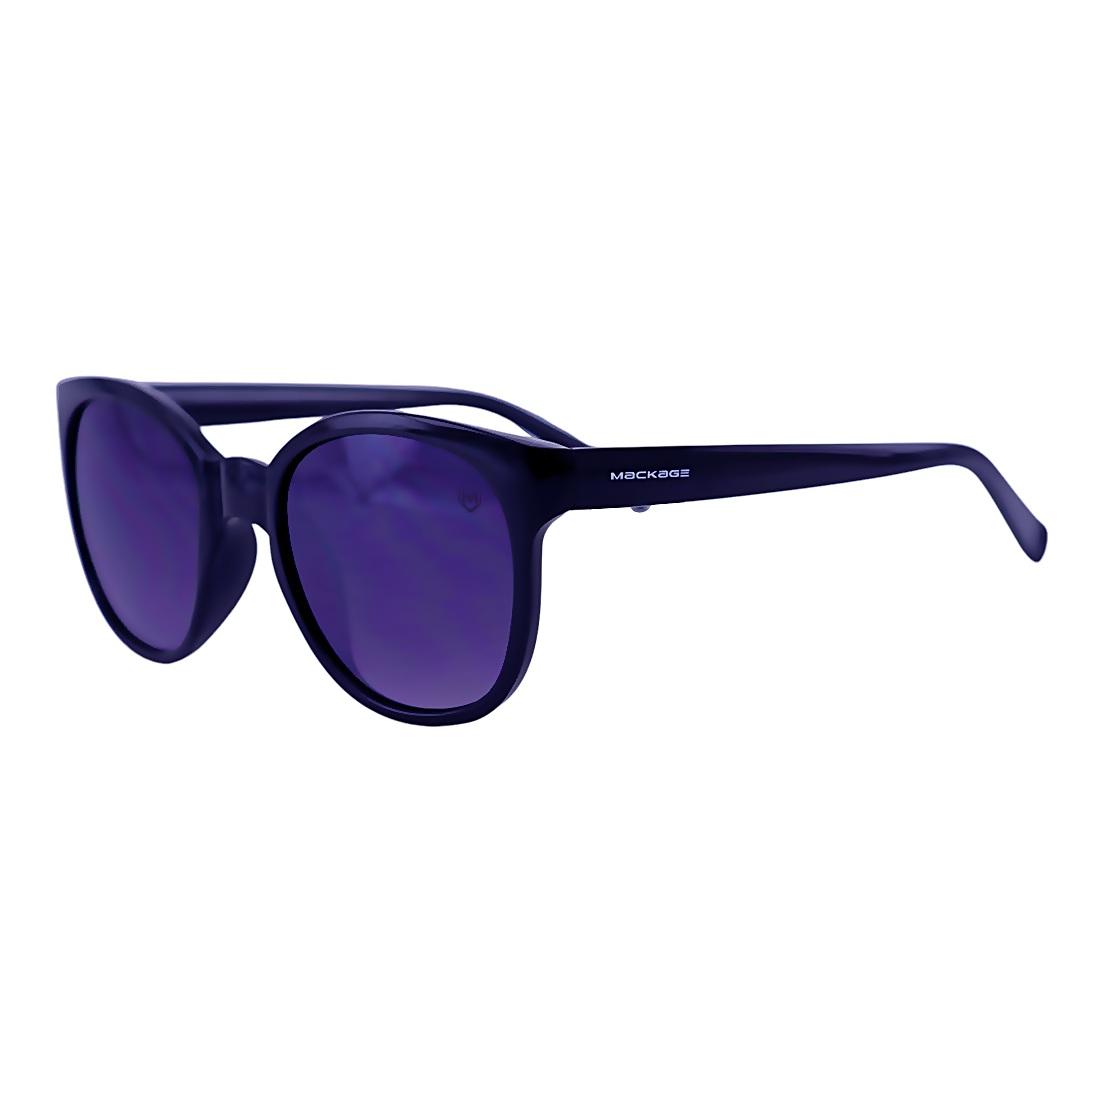 Óculos De Sol Mackage Feminino Acetato Oval Estilo Retro - Preto